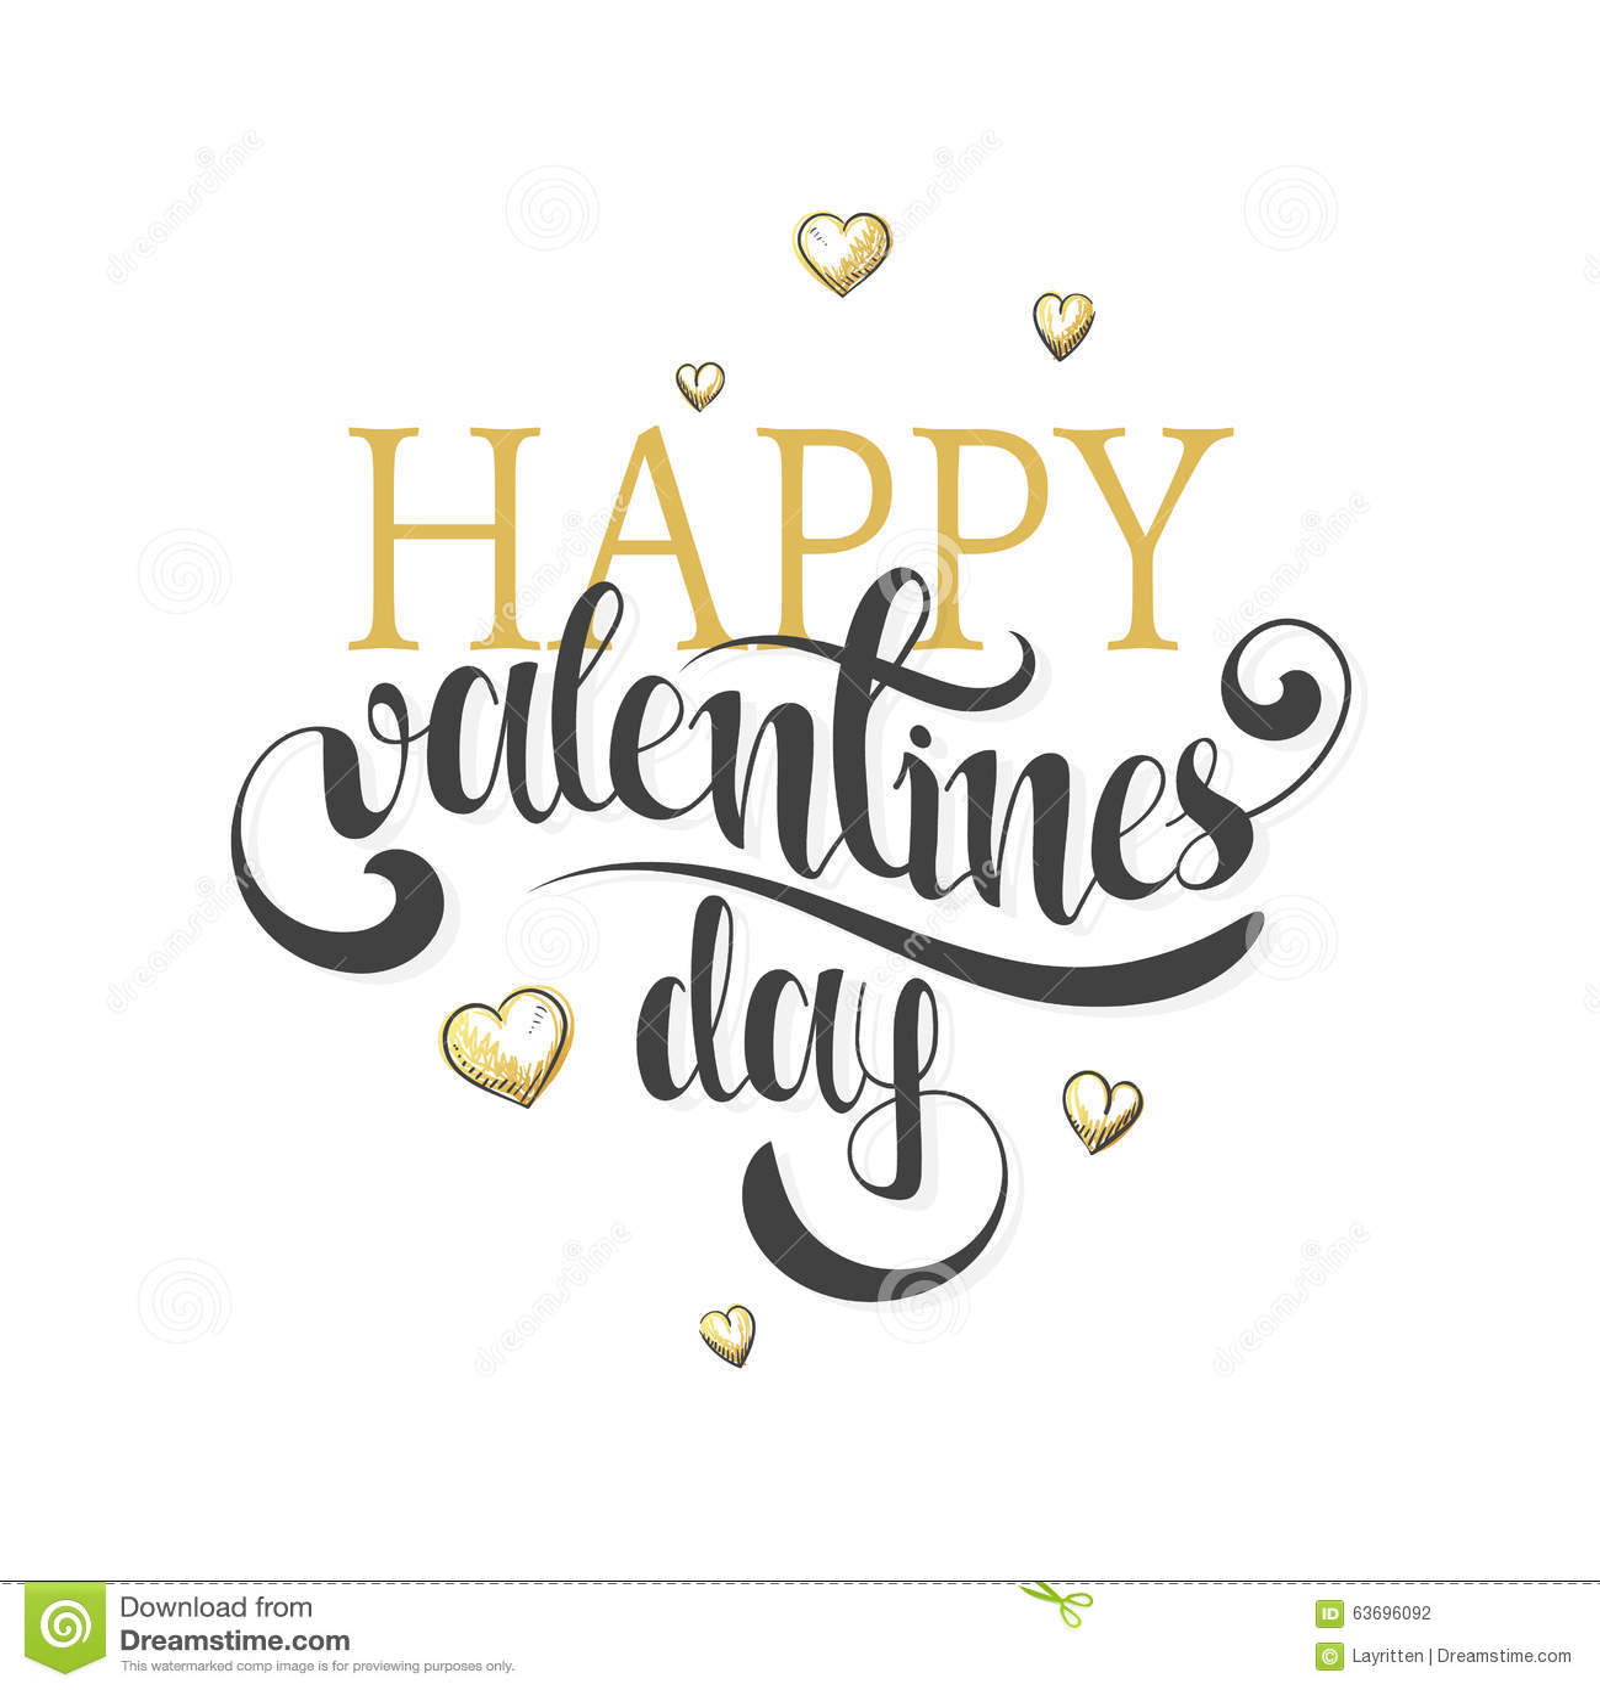 Stock Vector Happy valentines day. Gold phrase handmade. Stylish